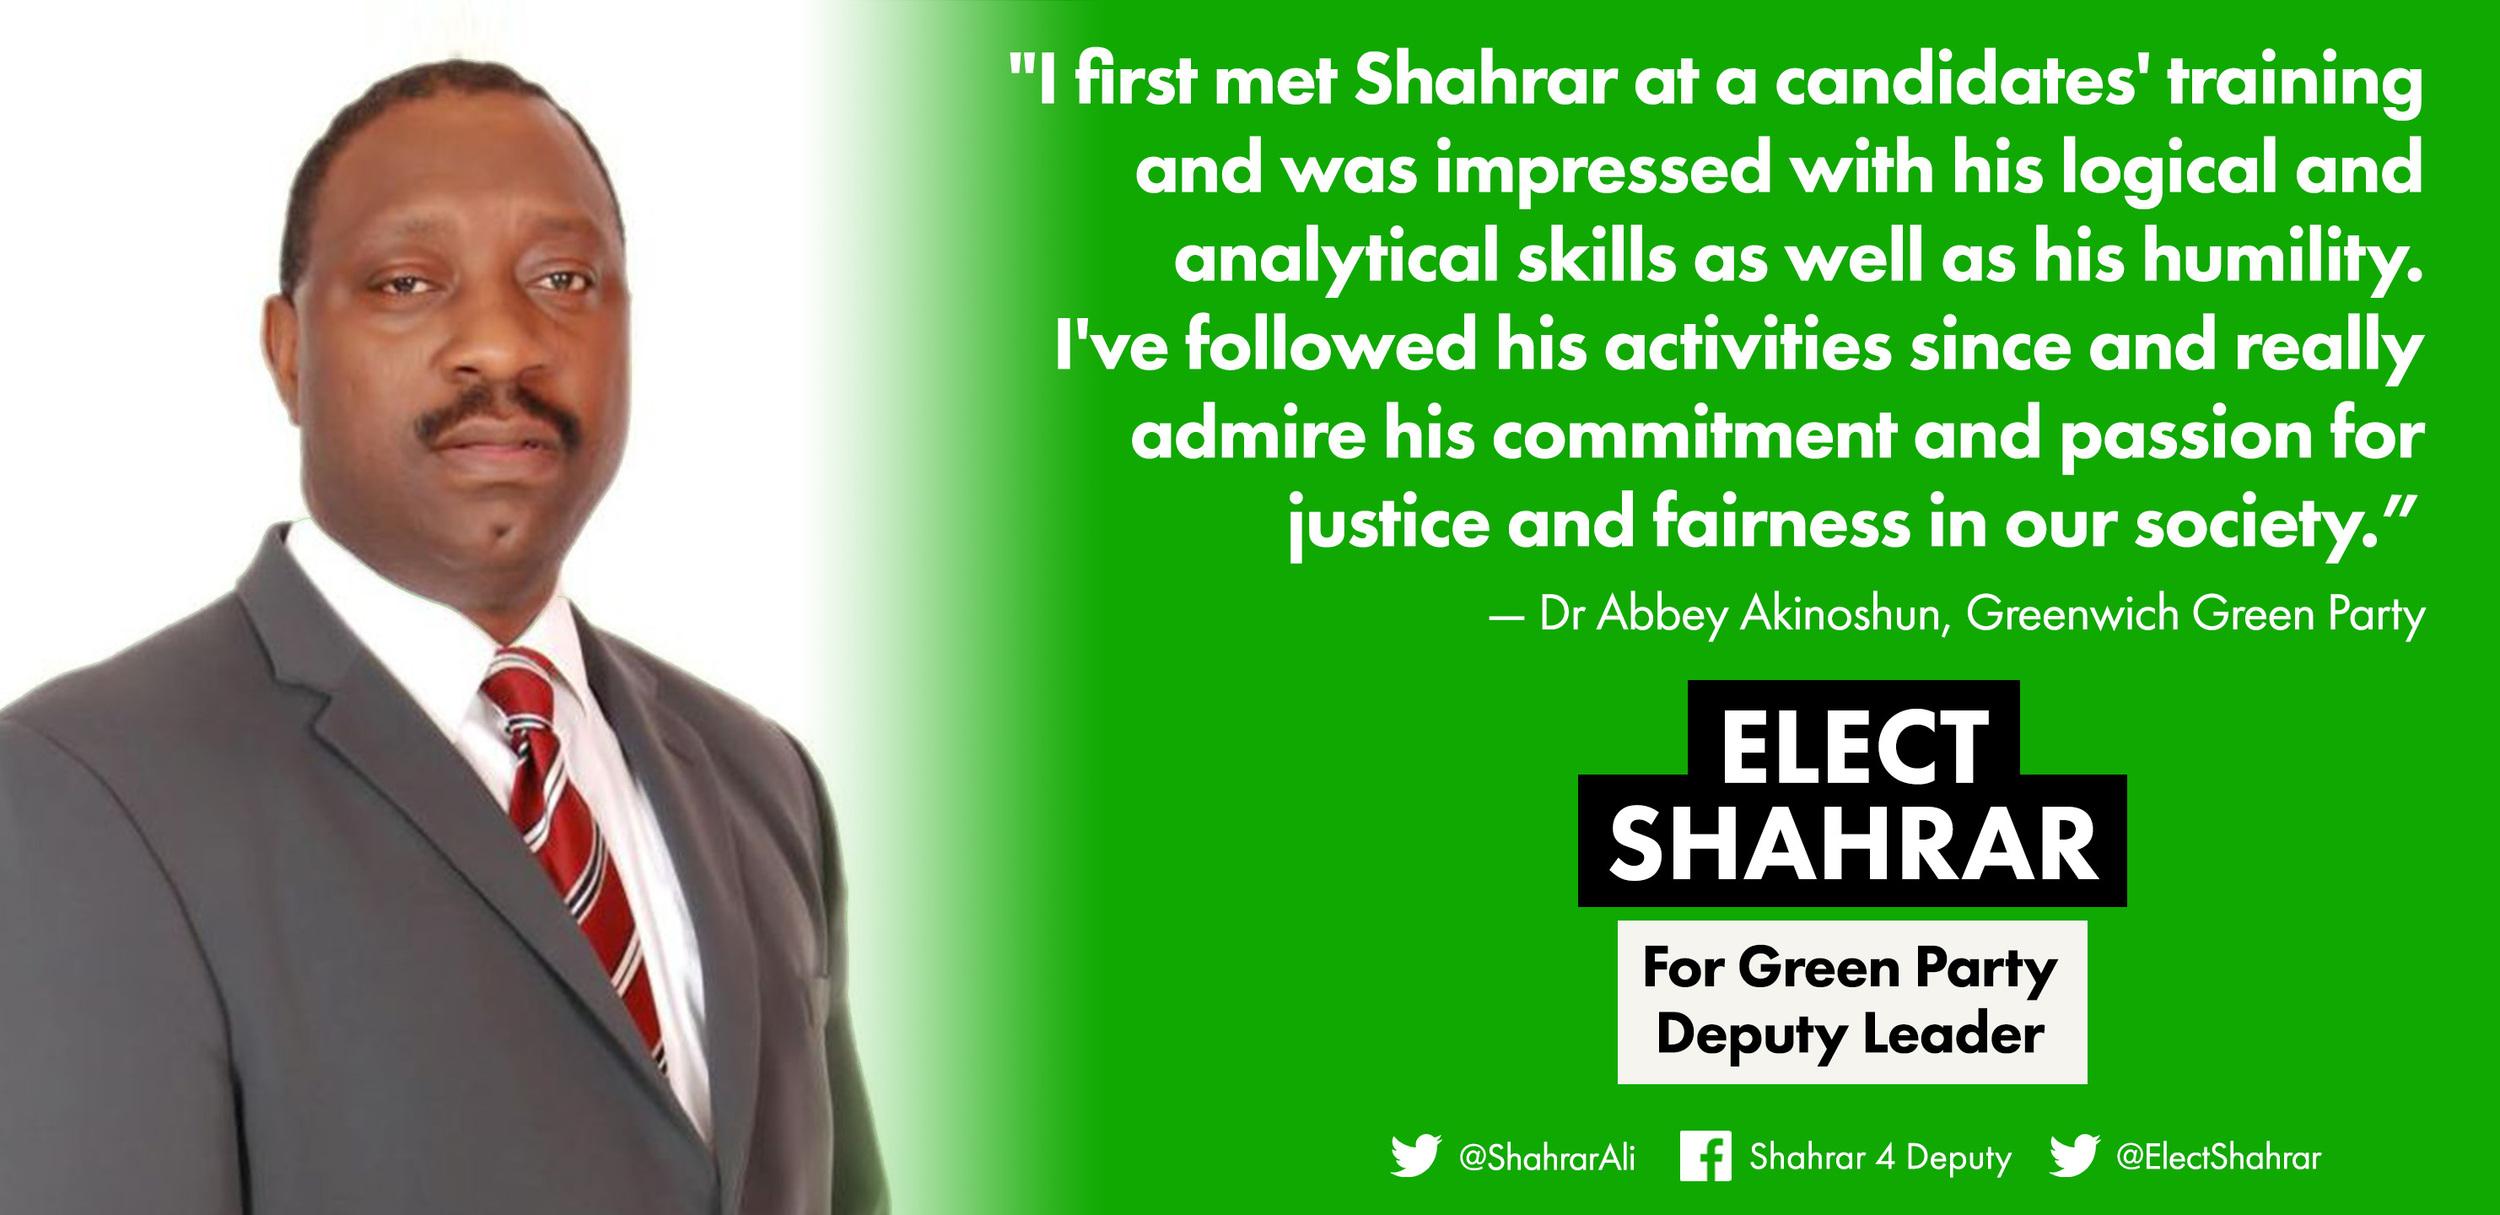 Elect Shahrar Dr Abbey Akinoshun Endorsement.jpg